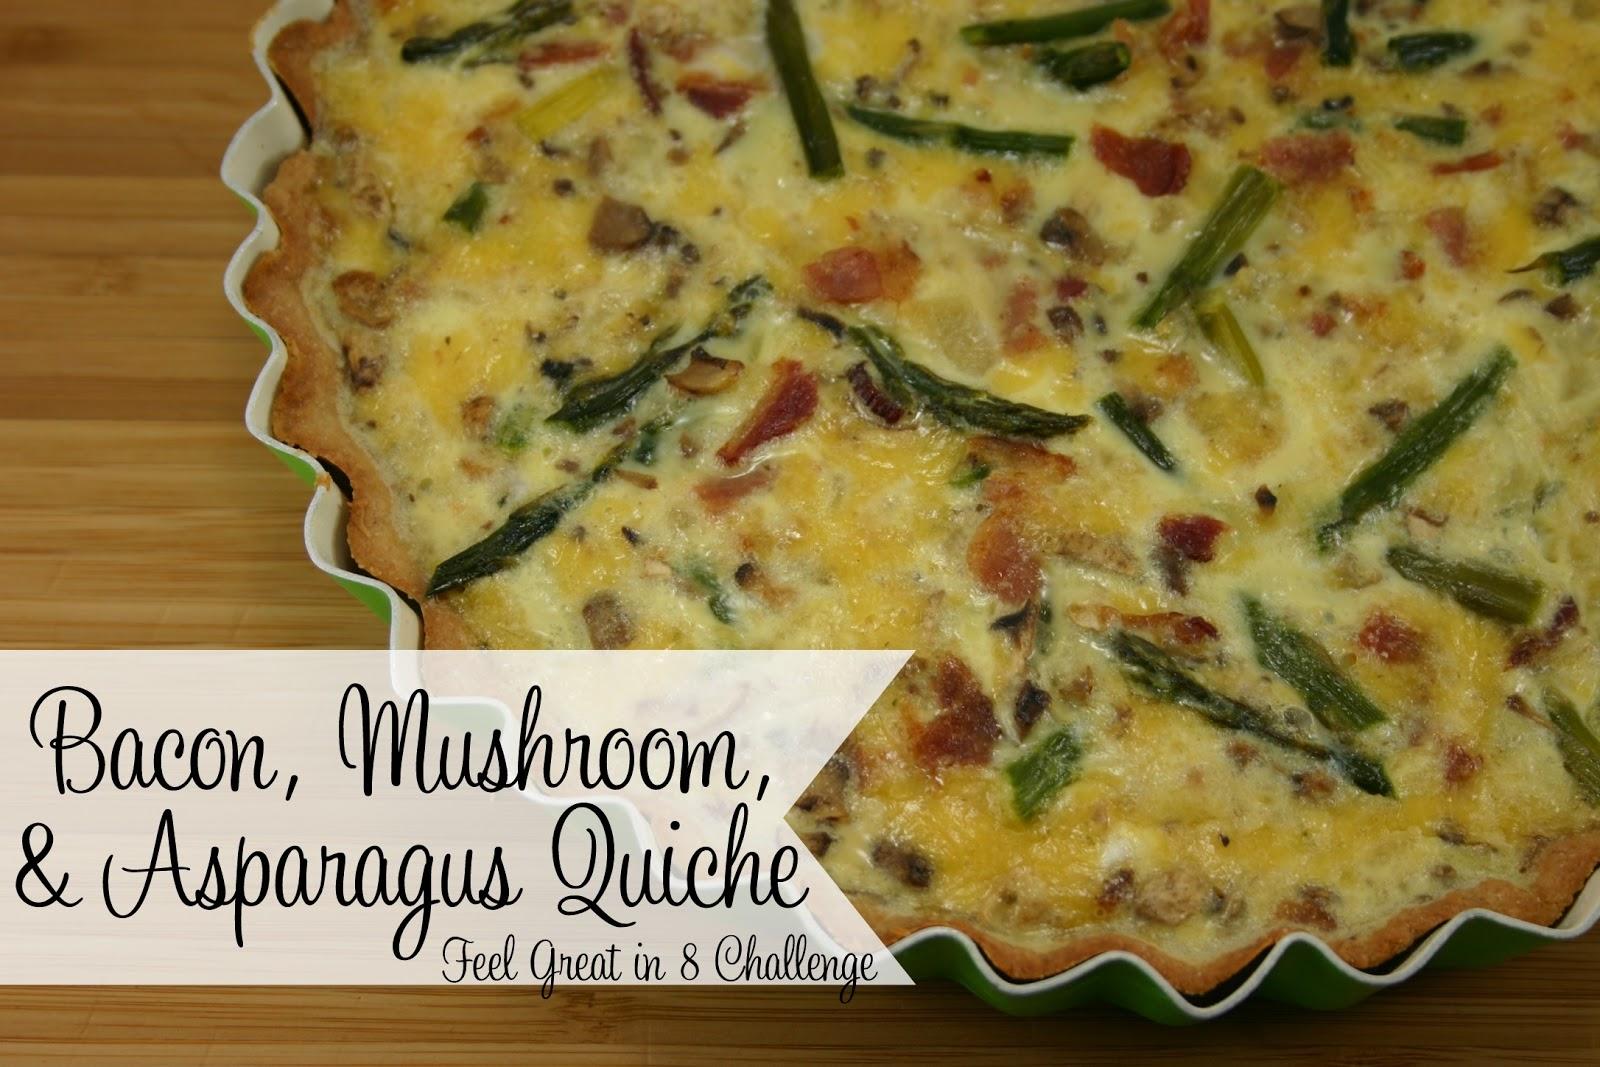 ... .blogspot.com/2013/04/bacon-mushroom-asparagus-quiche.html